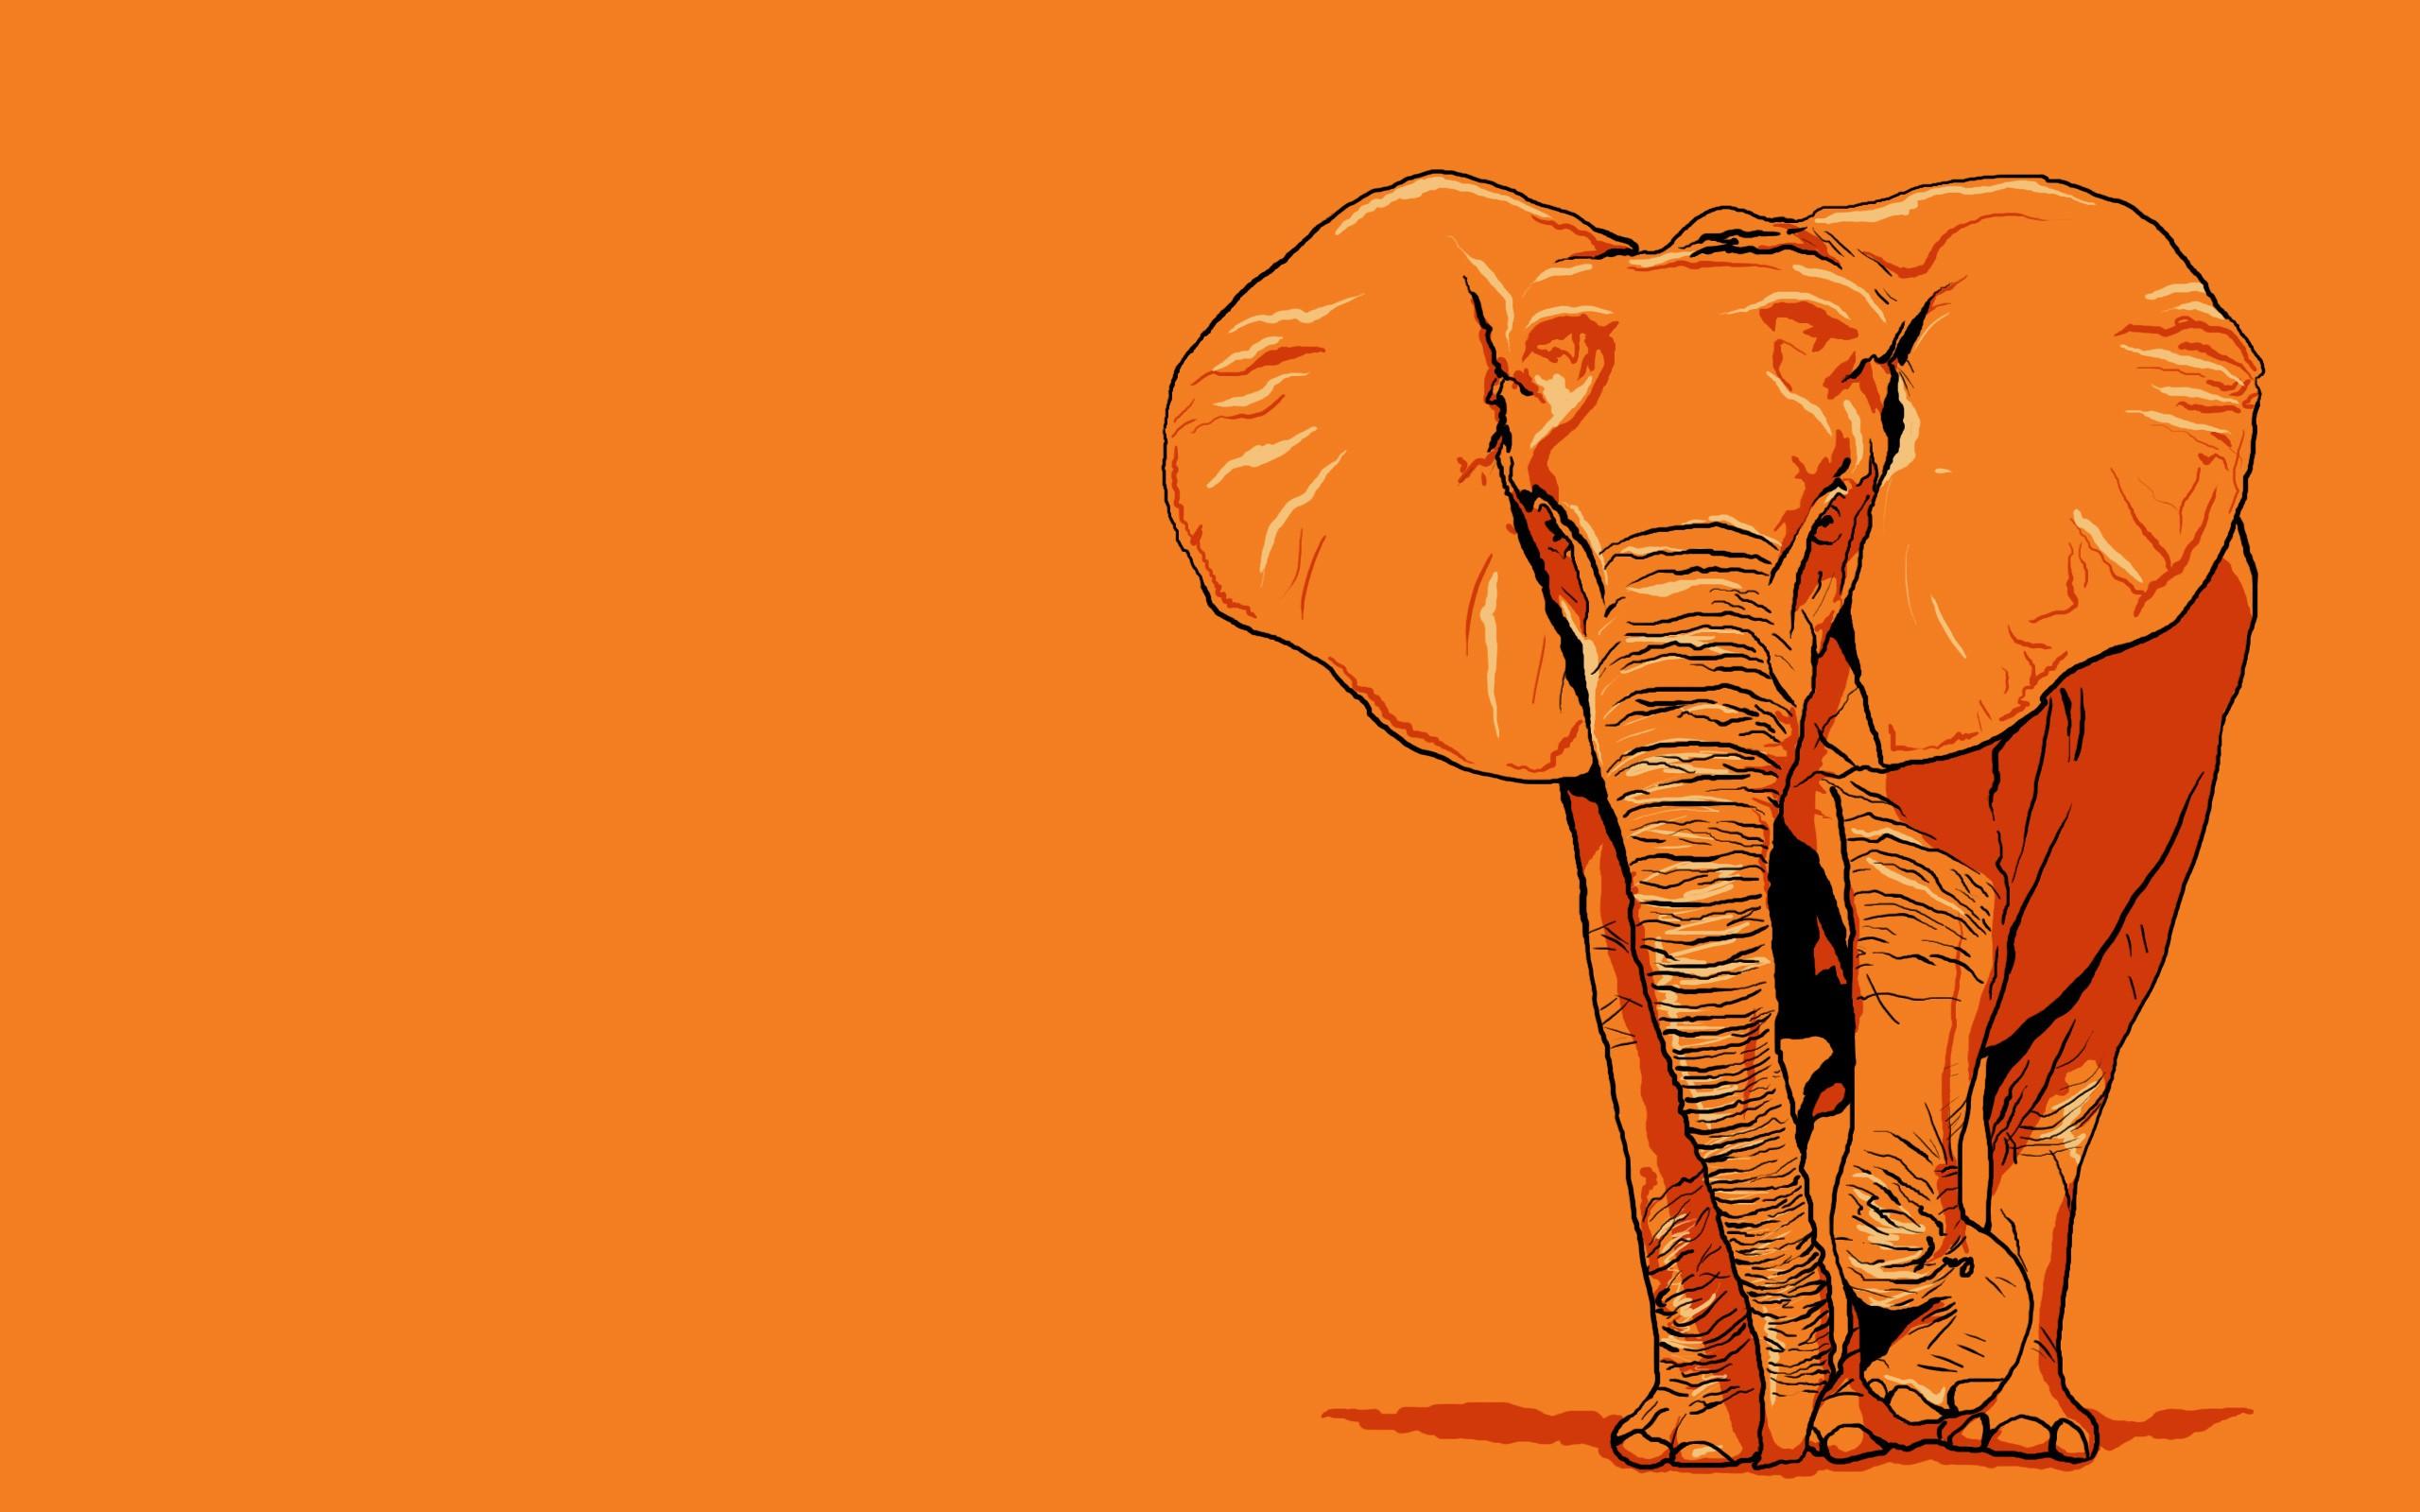 Download Wallpaper Cartoon Elephant - illustration-cartoon-elephant-mammal-vertebrate-savanna-elephants-and-mammoths-185448  Picture_503425  .jpg